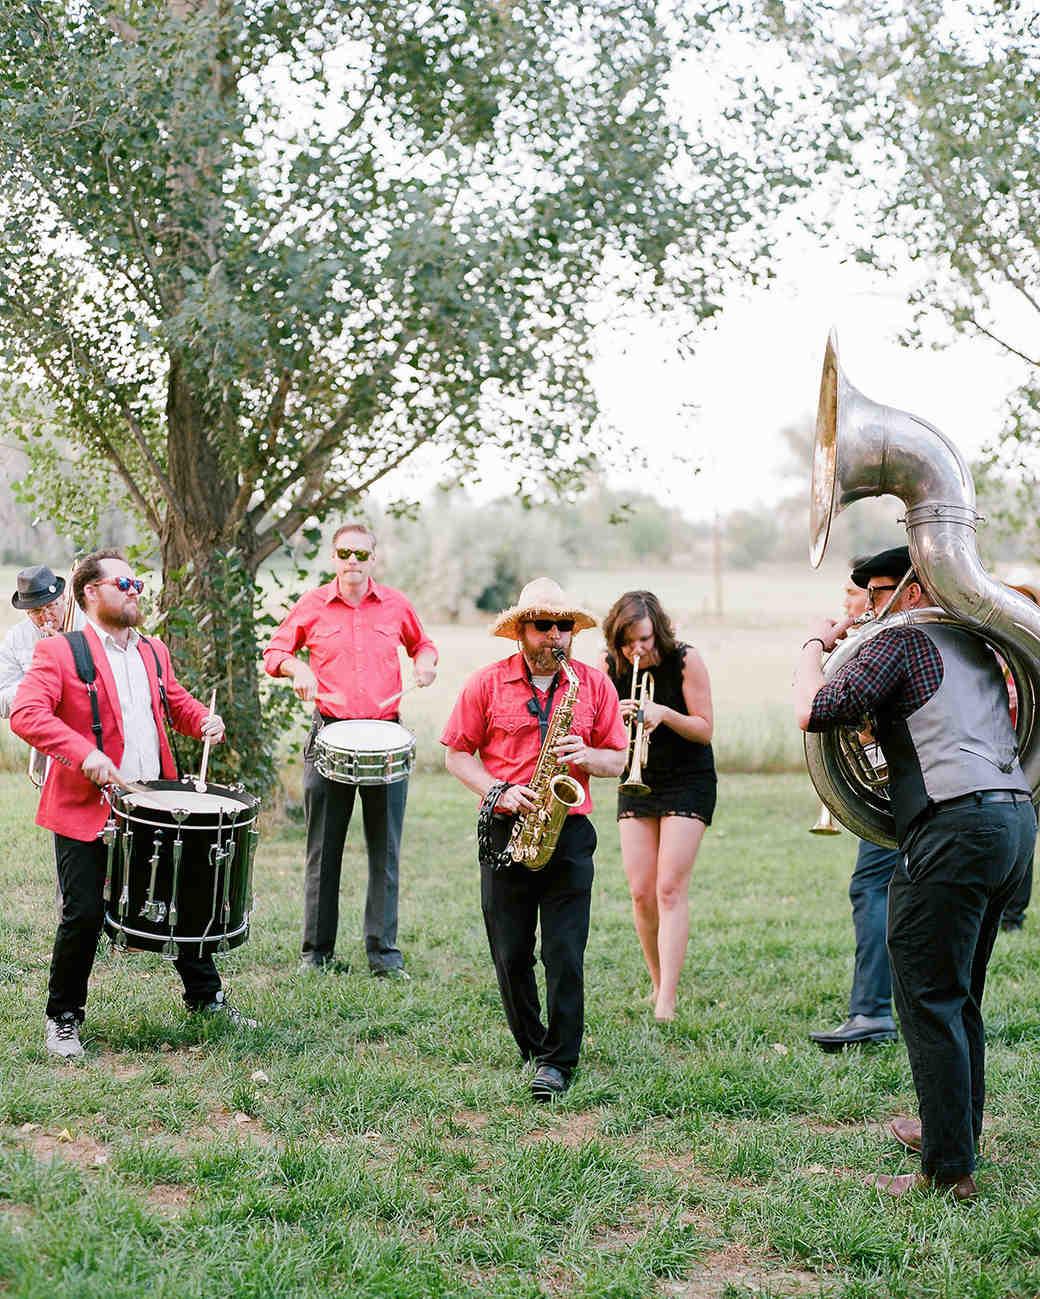 jamie jon wedding band playing